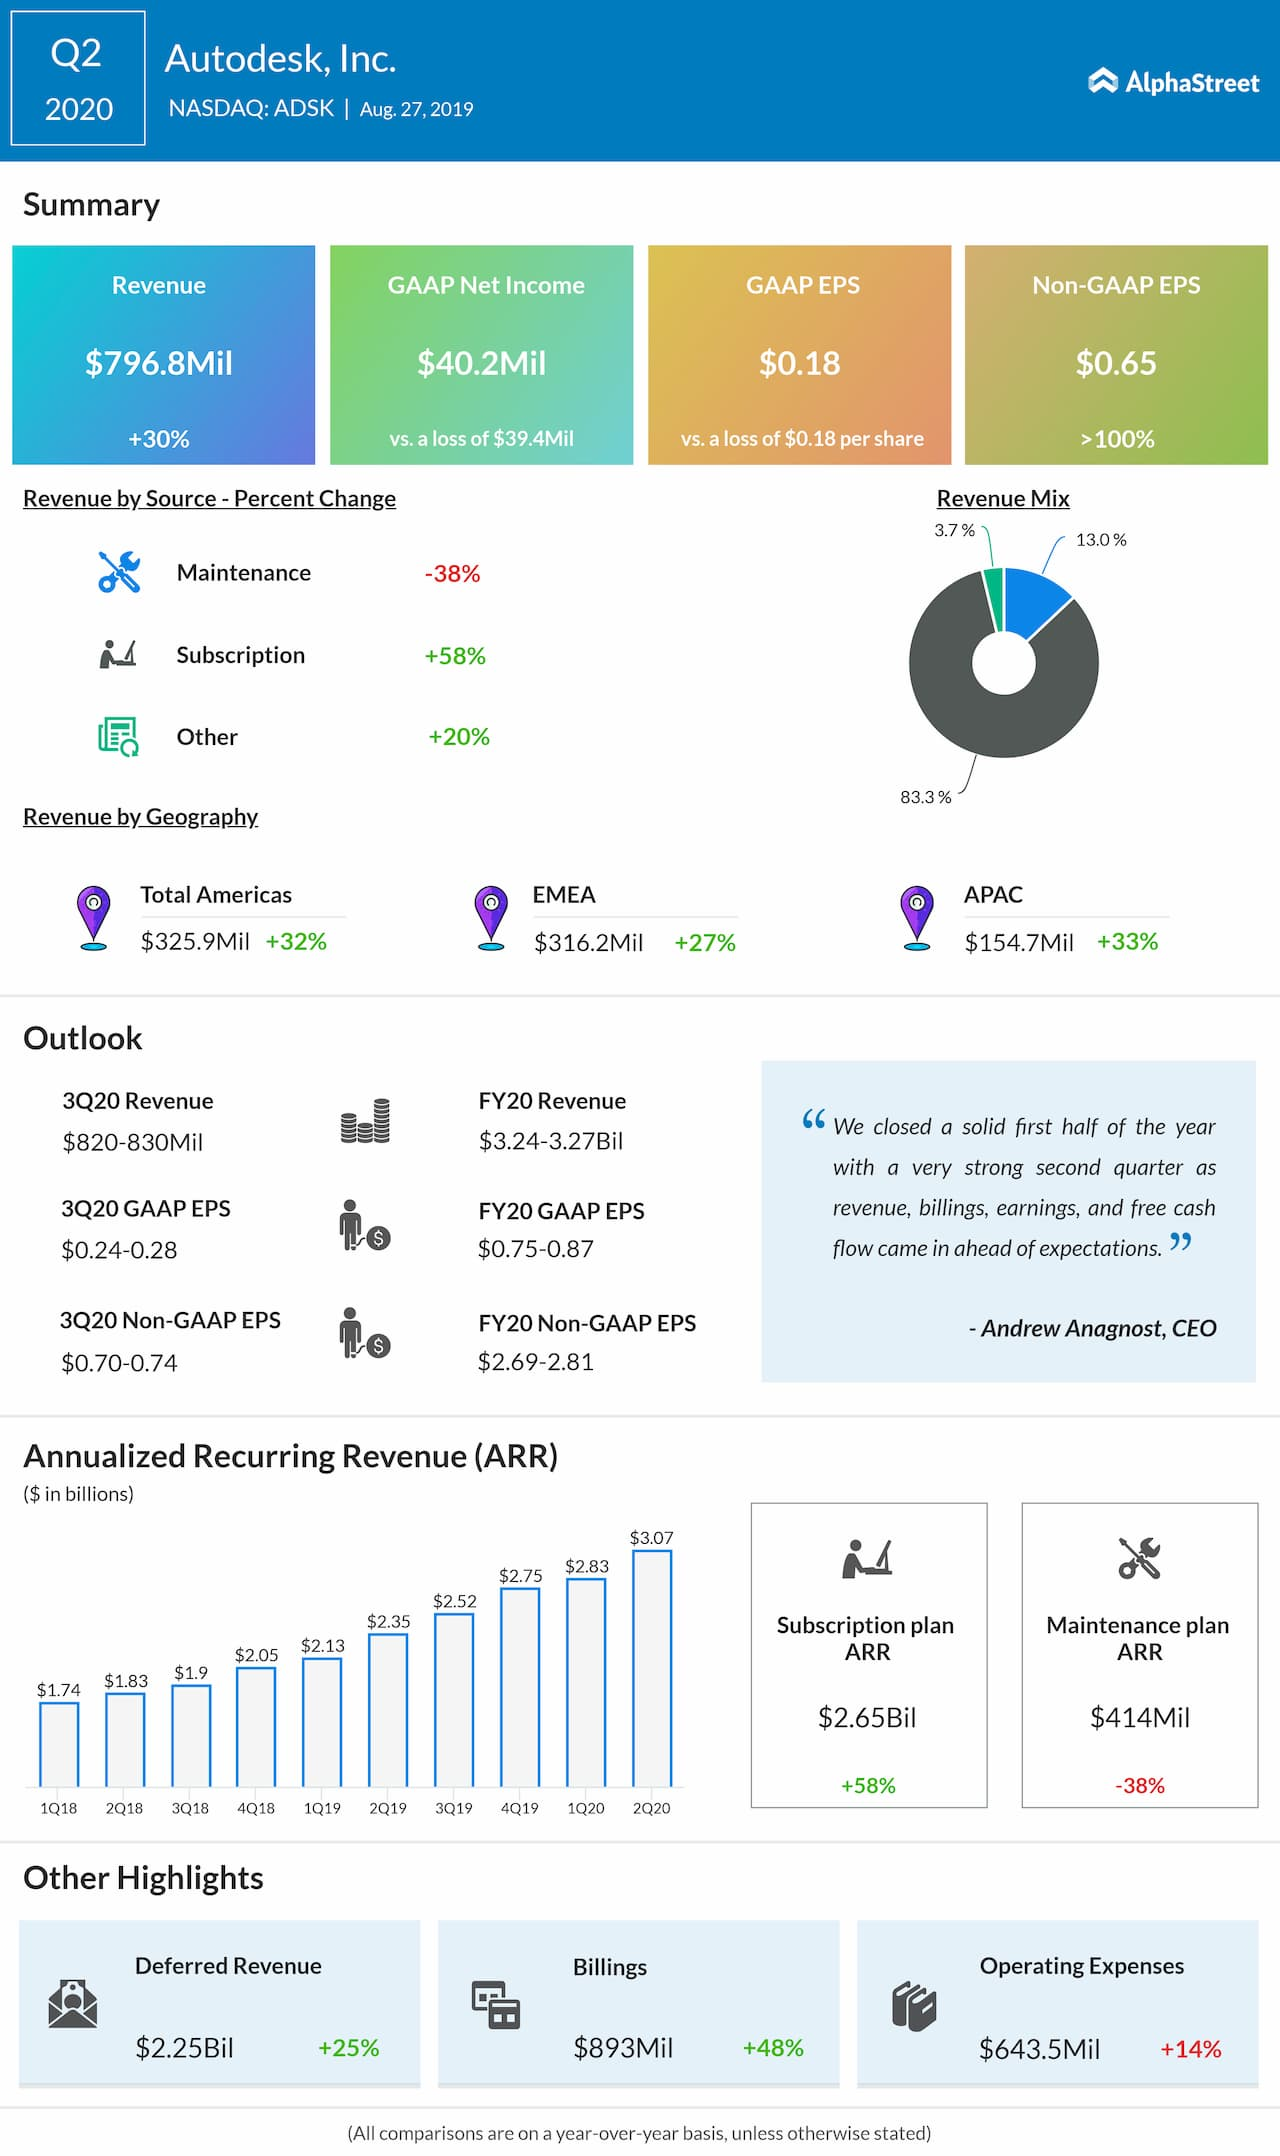 Autodesk Q2 2020 earnings report